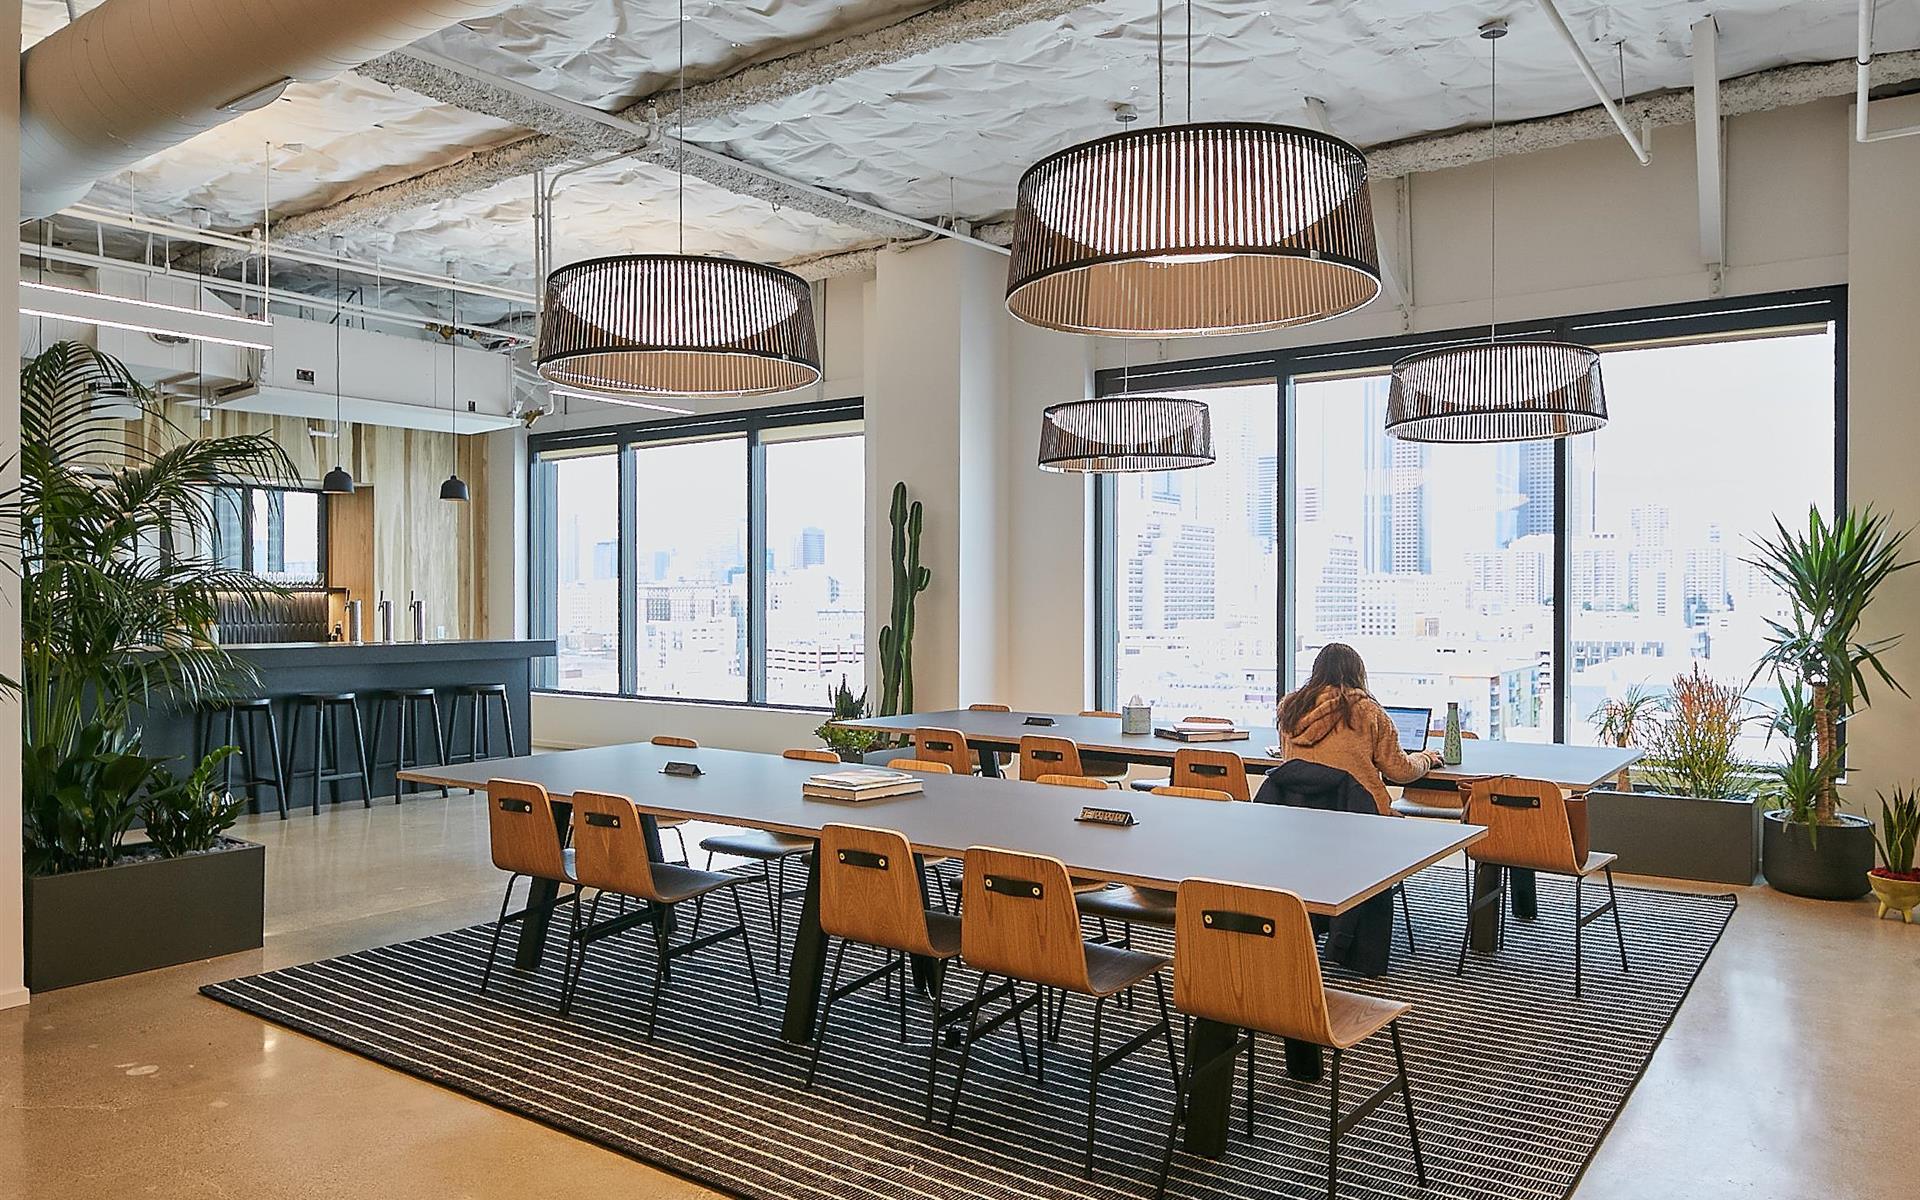 CENTRL Office Downtown Los Angeles - Open Membership Desk